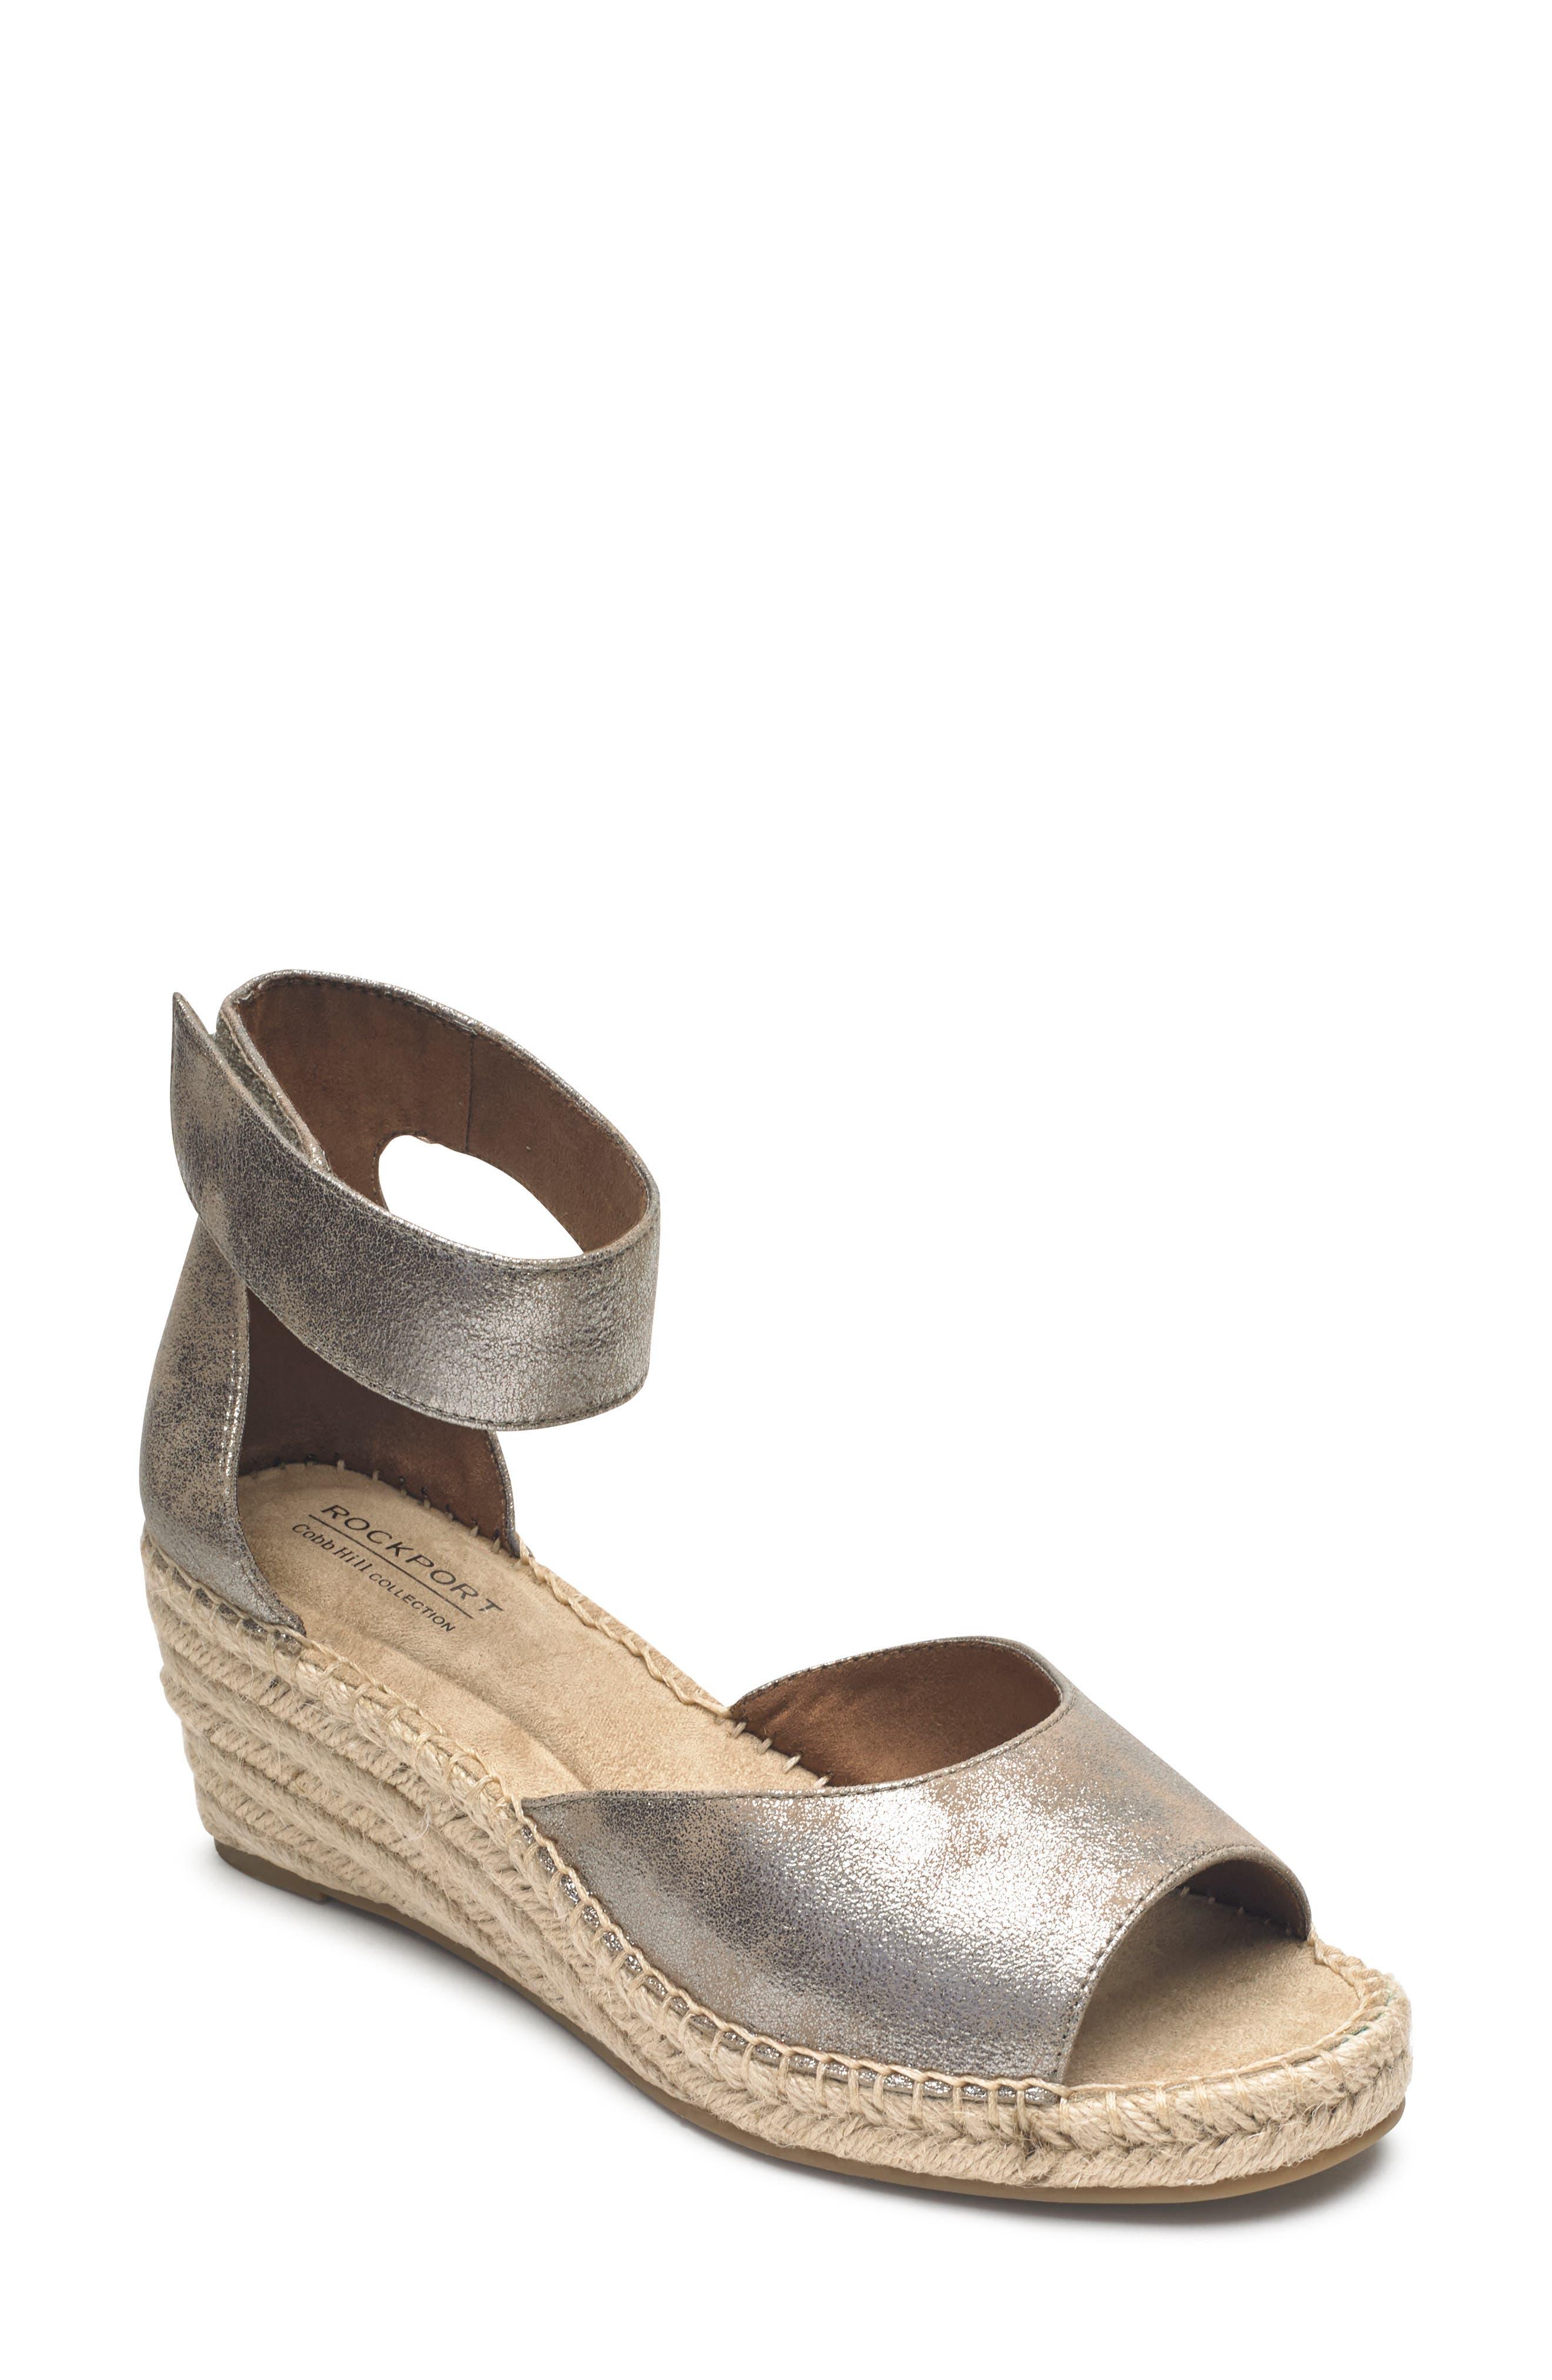 885ceceb2 Women s Rockport Cobb Hill Flat Heeled Sandals